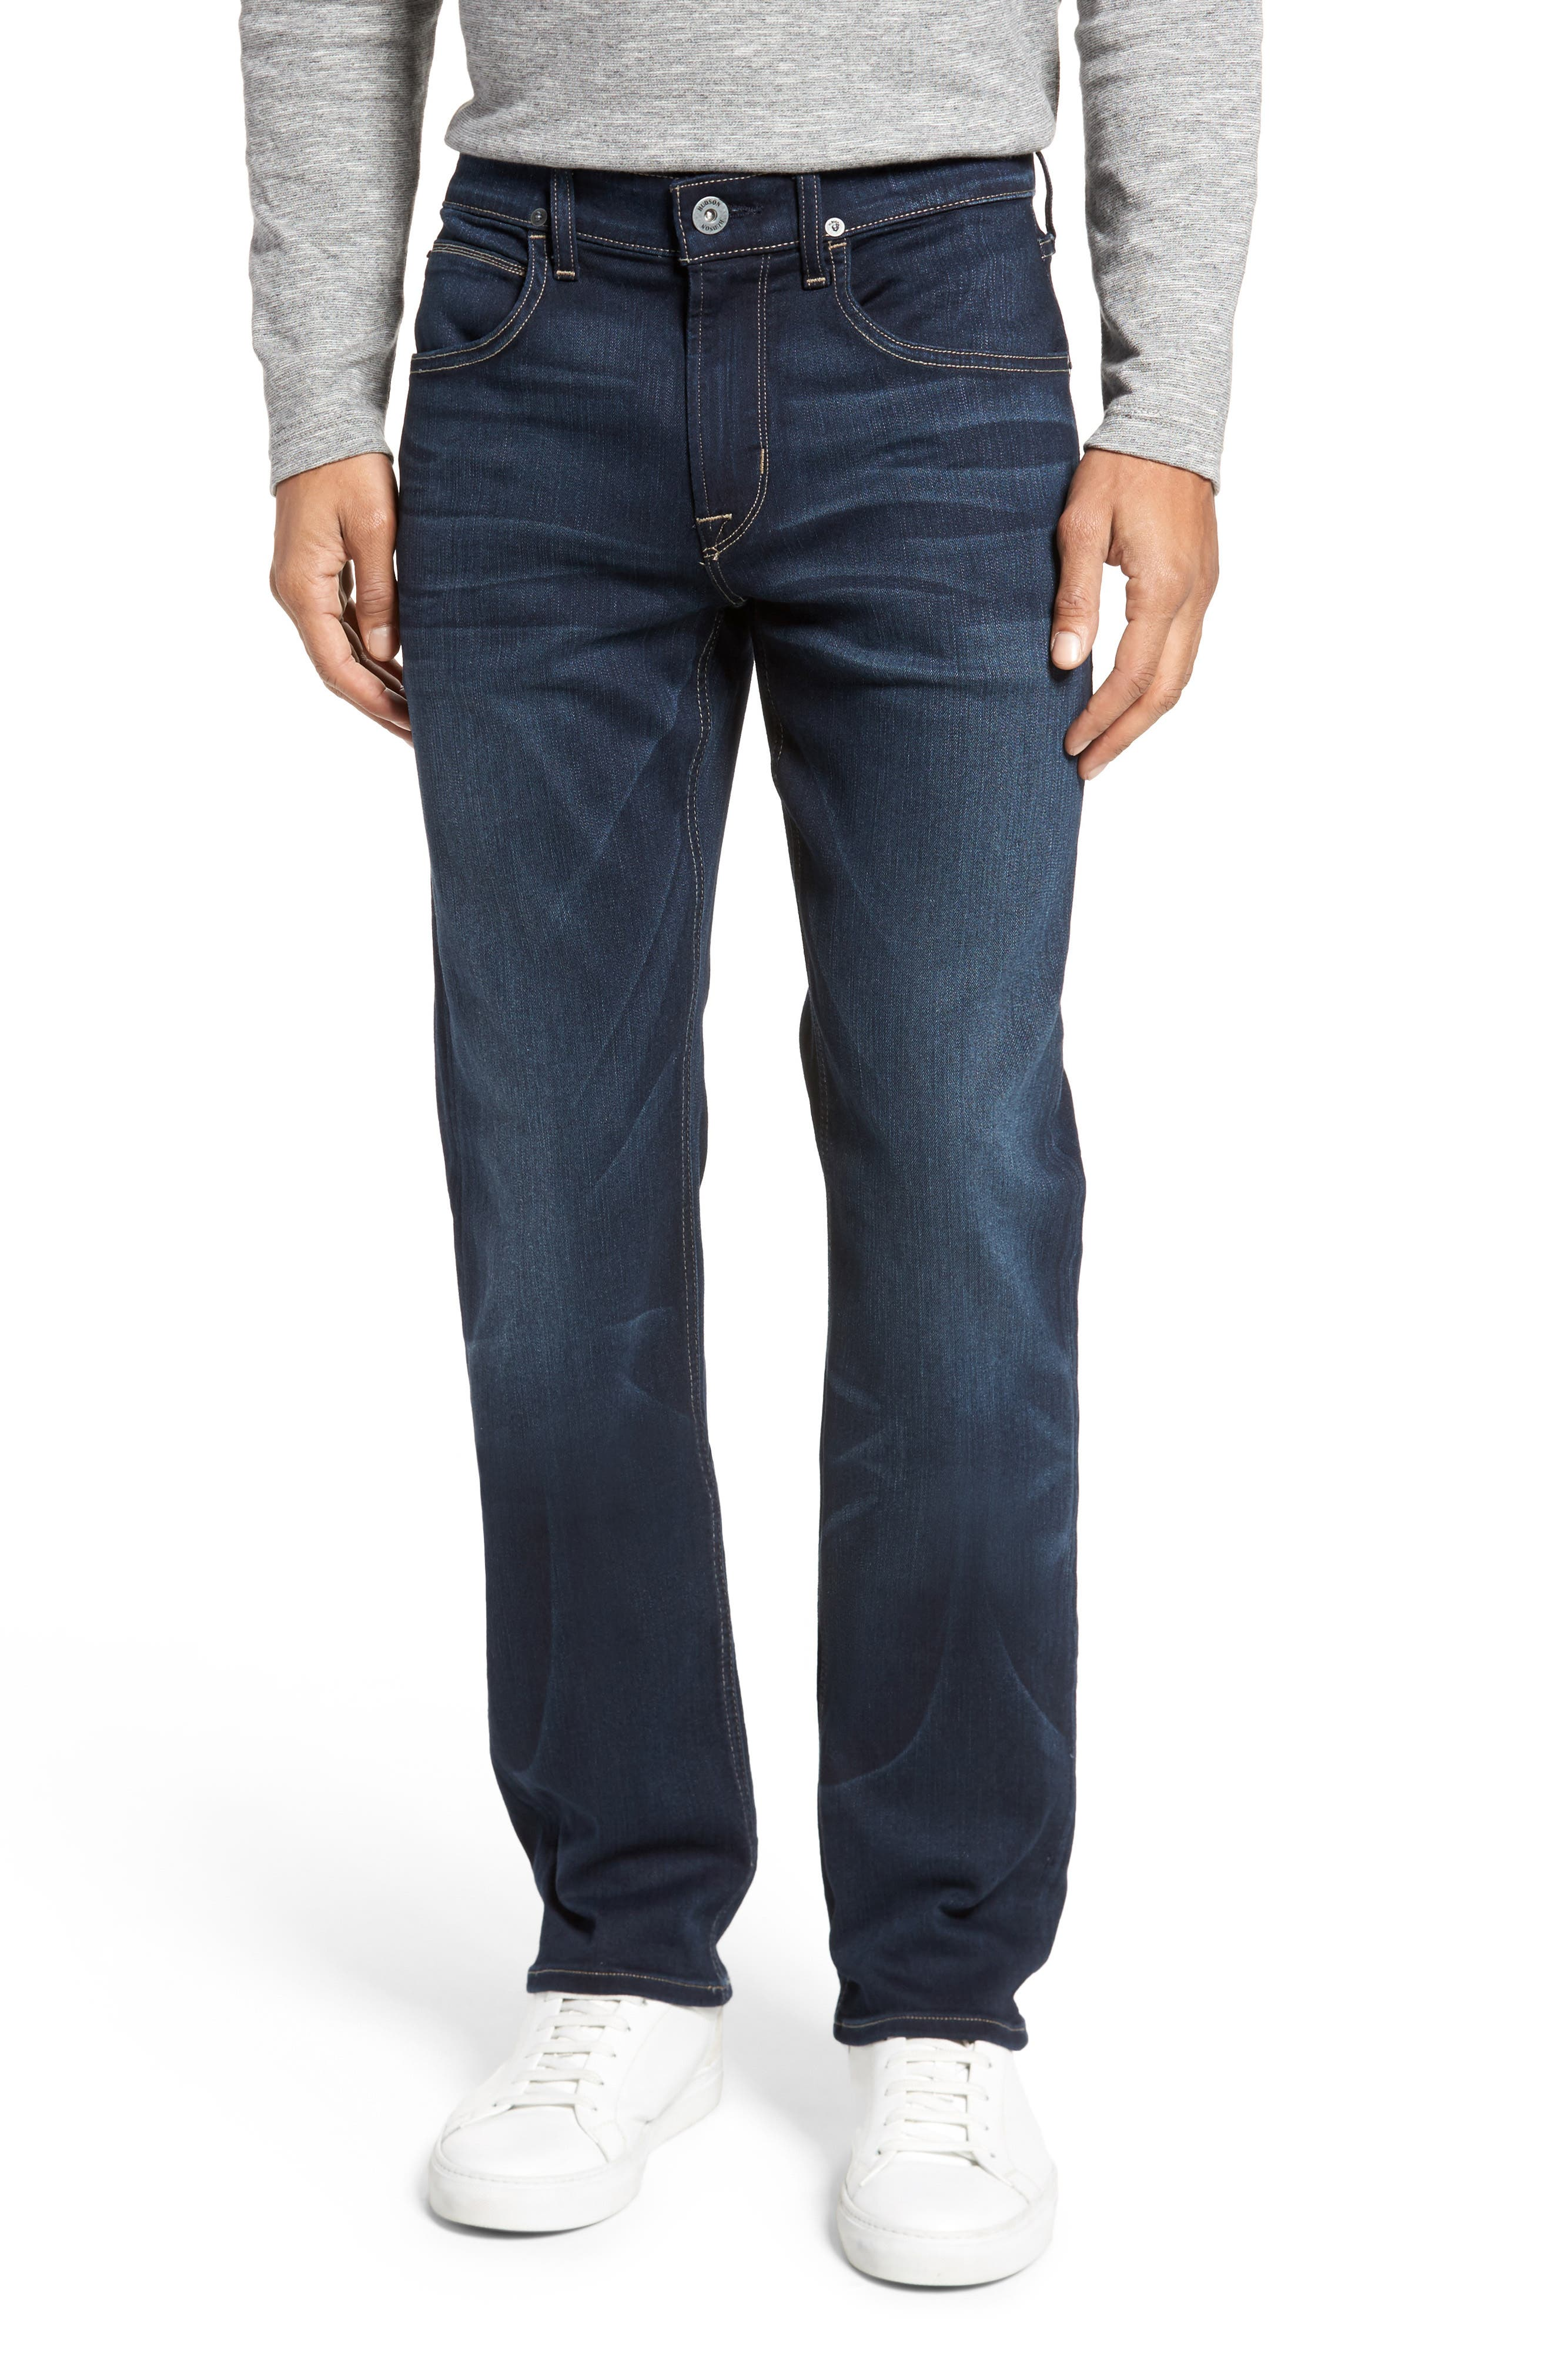 Hudson Jeans Byron Slim Straight Fit Jeans (Newburyport)